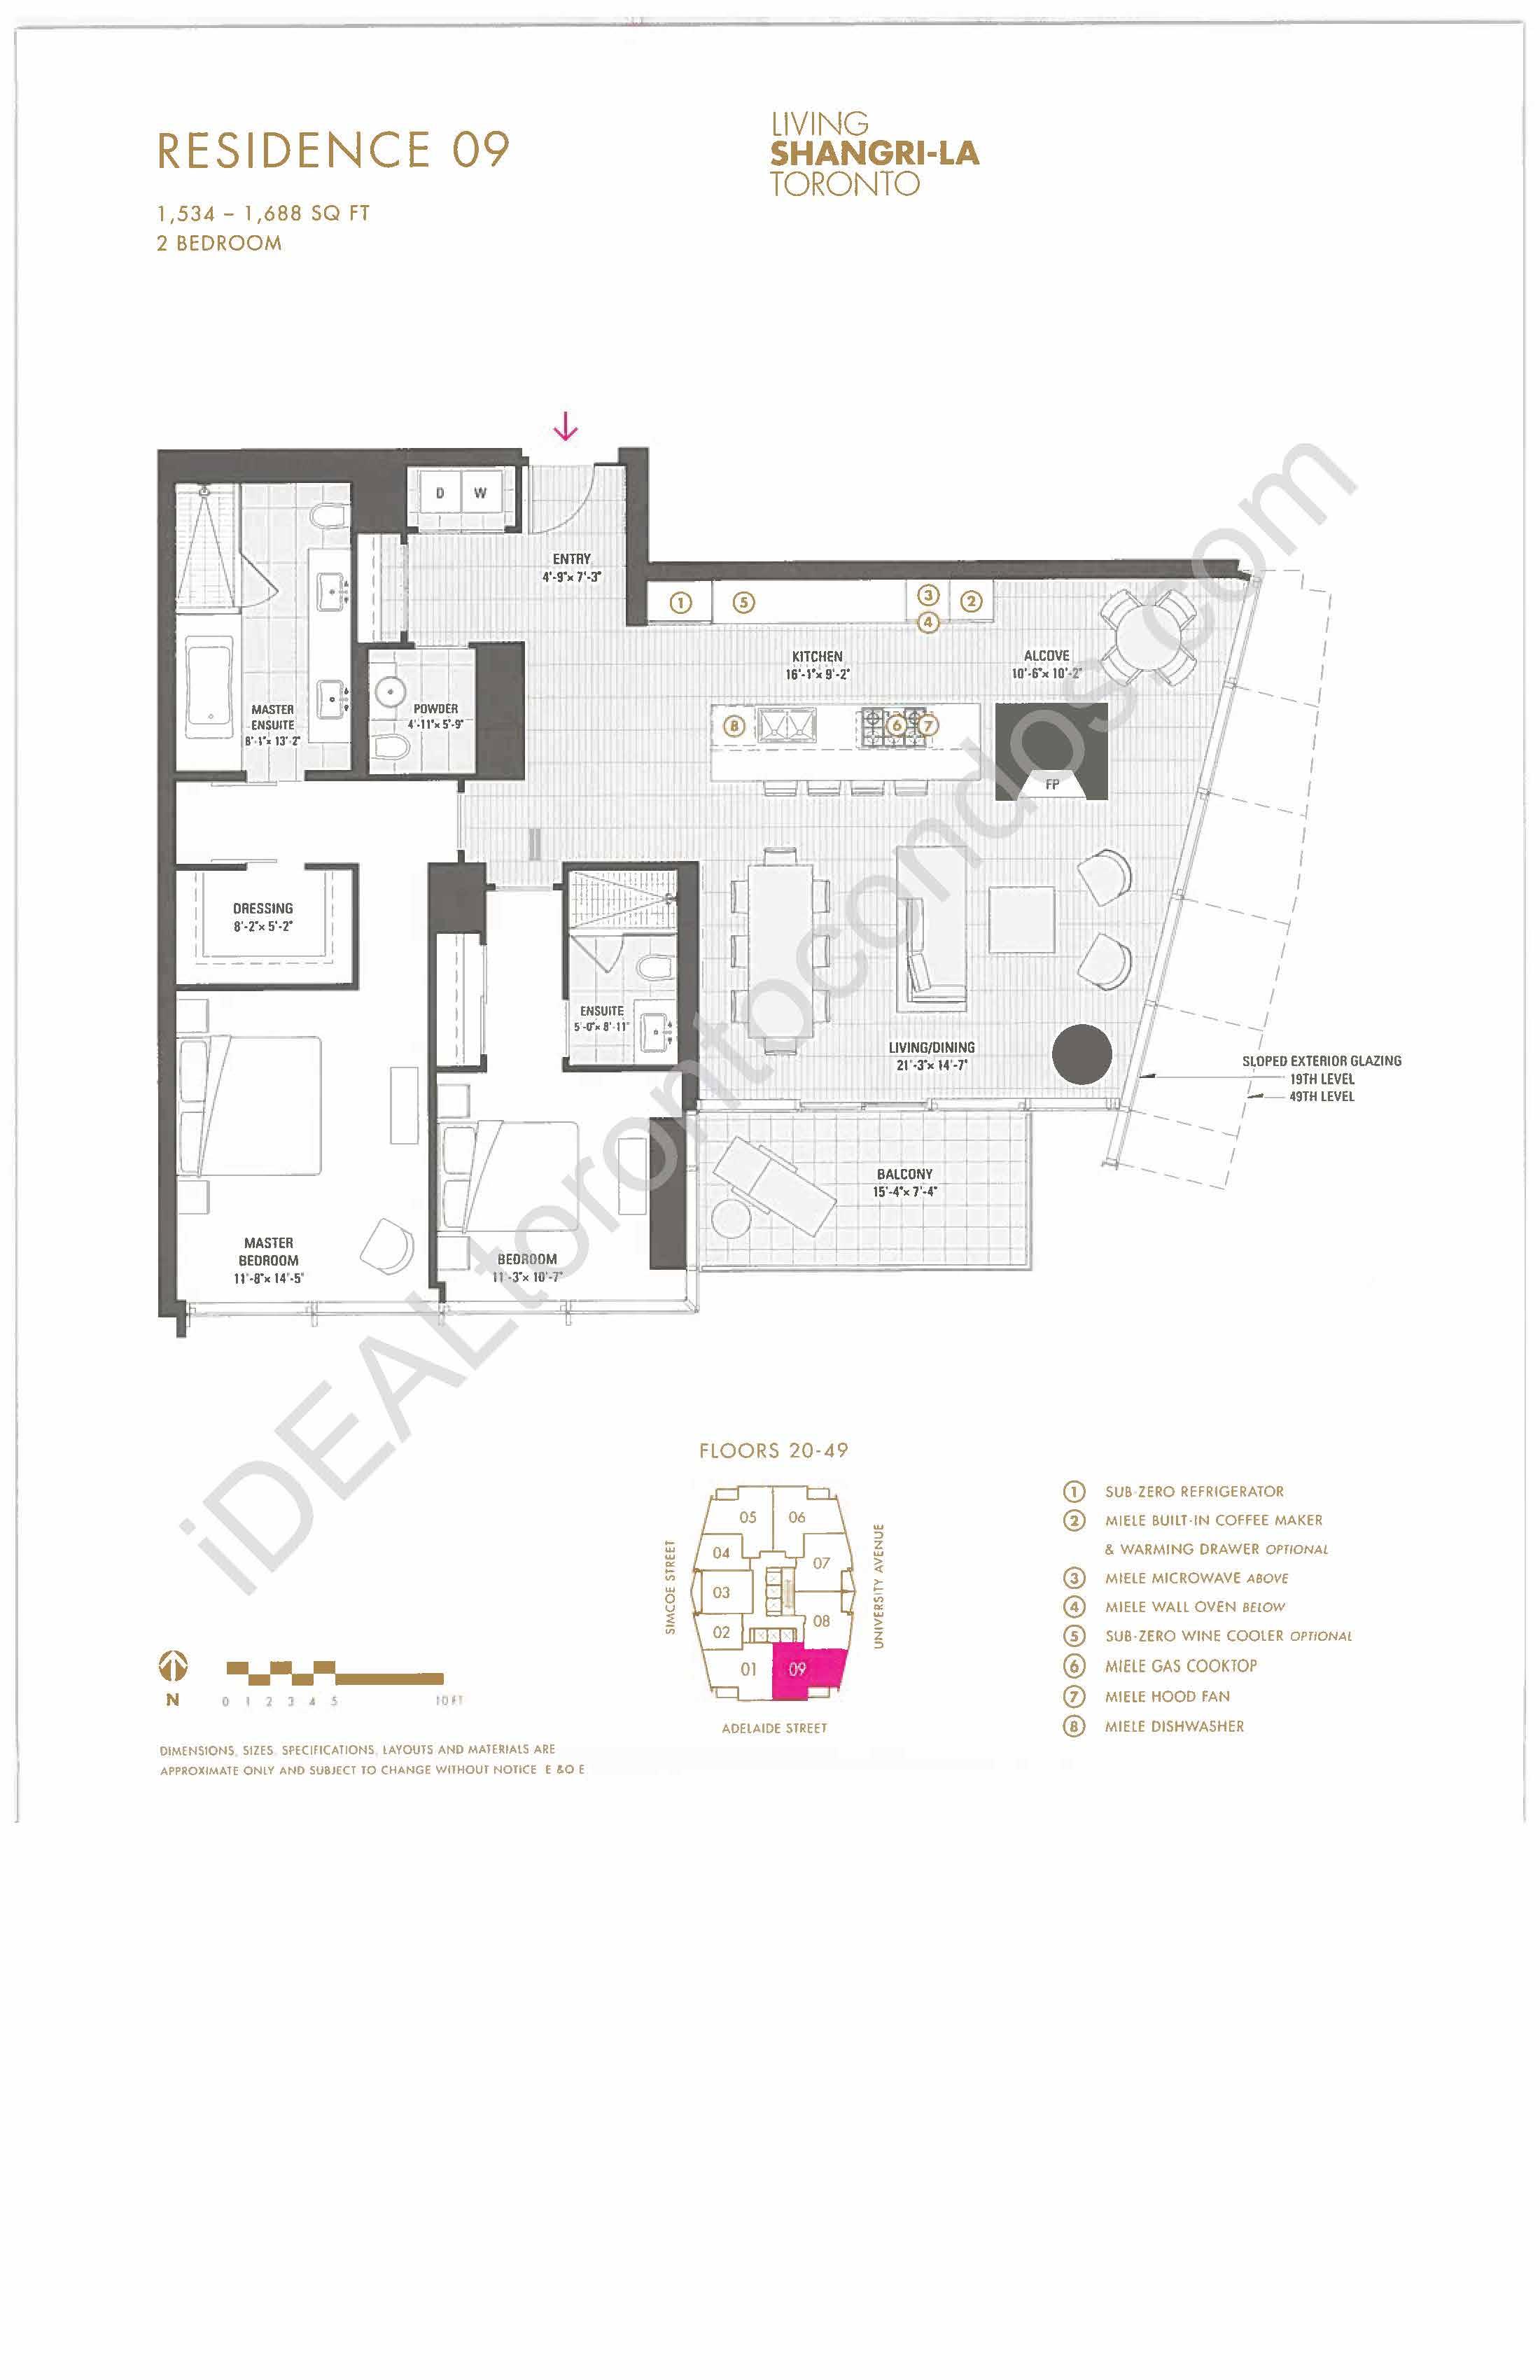 Residence 09 - 2 Bedroom